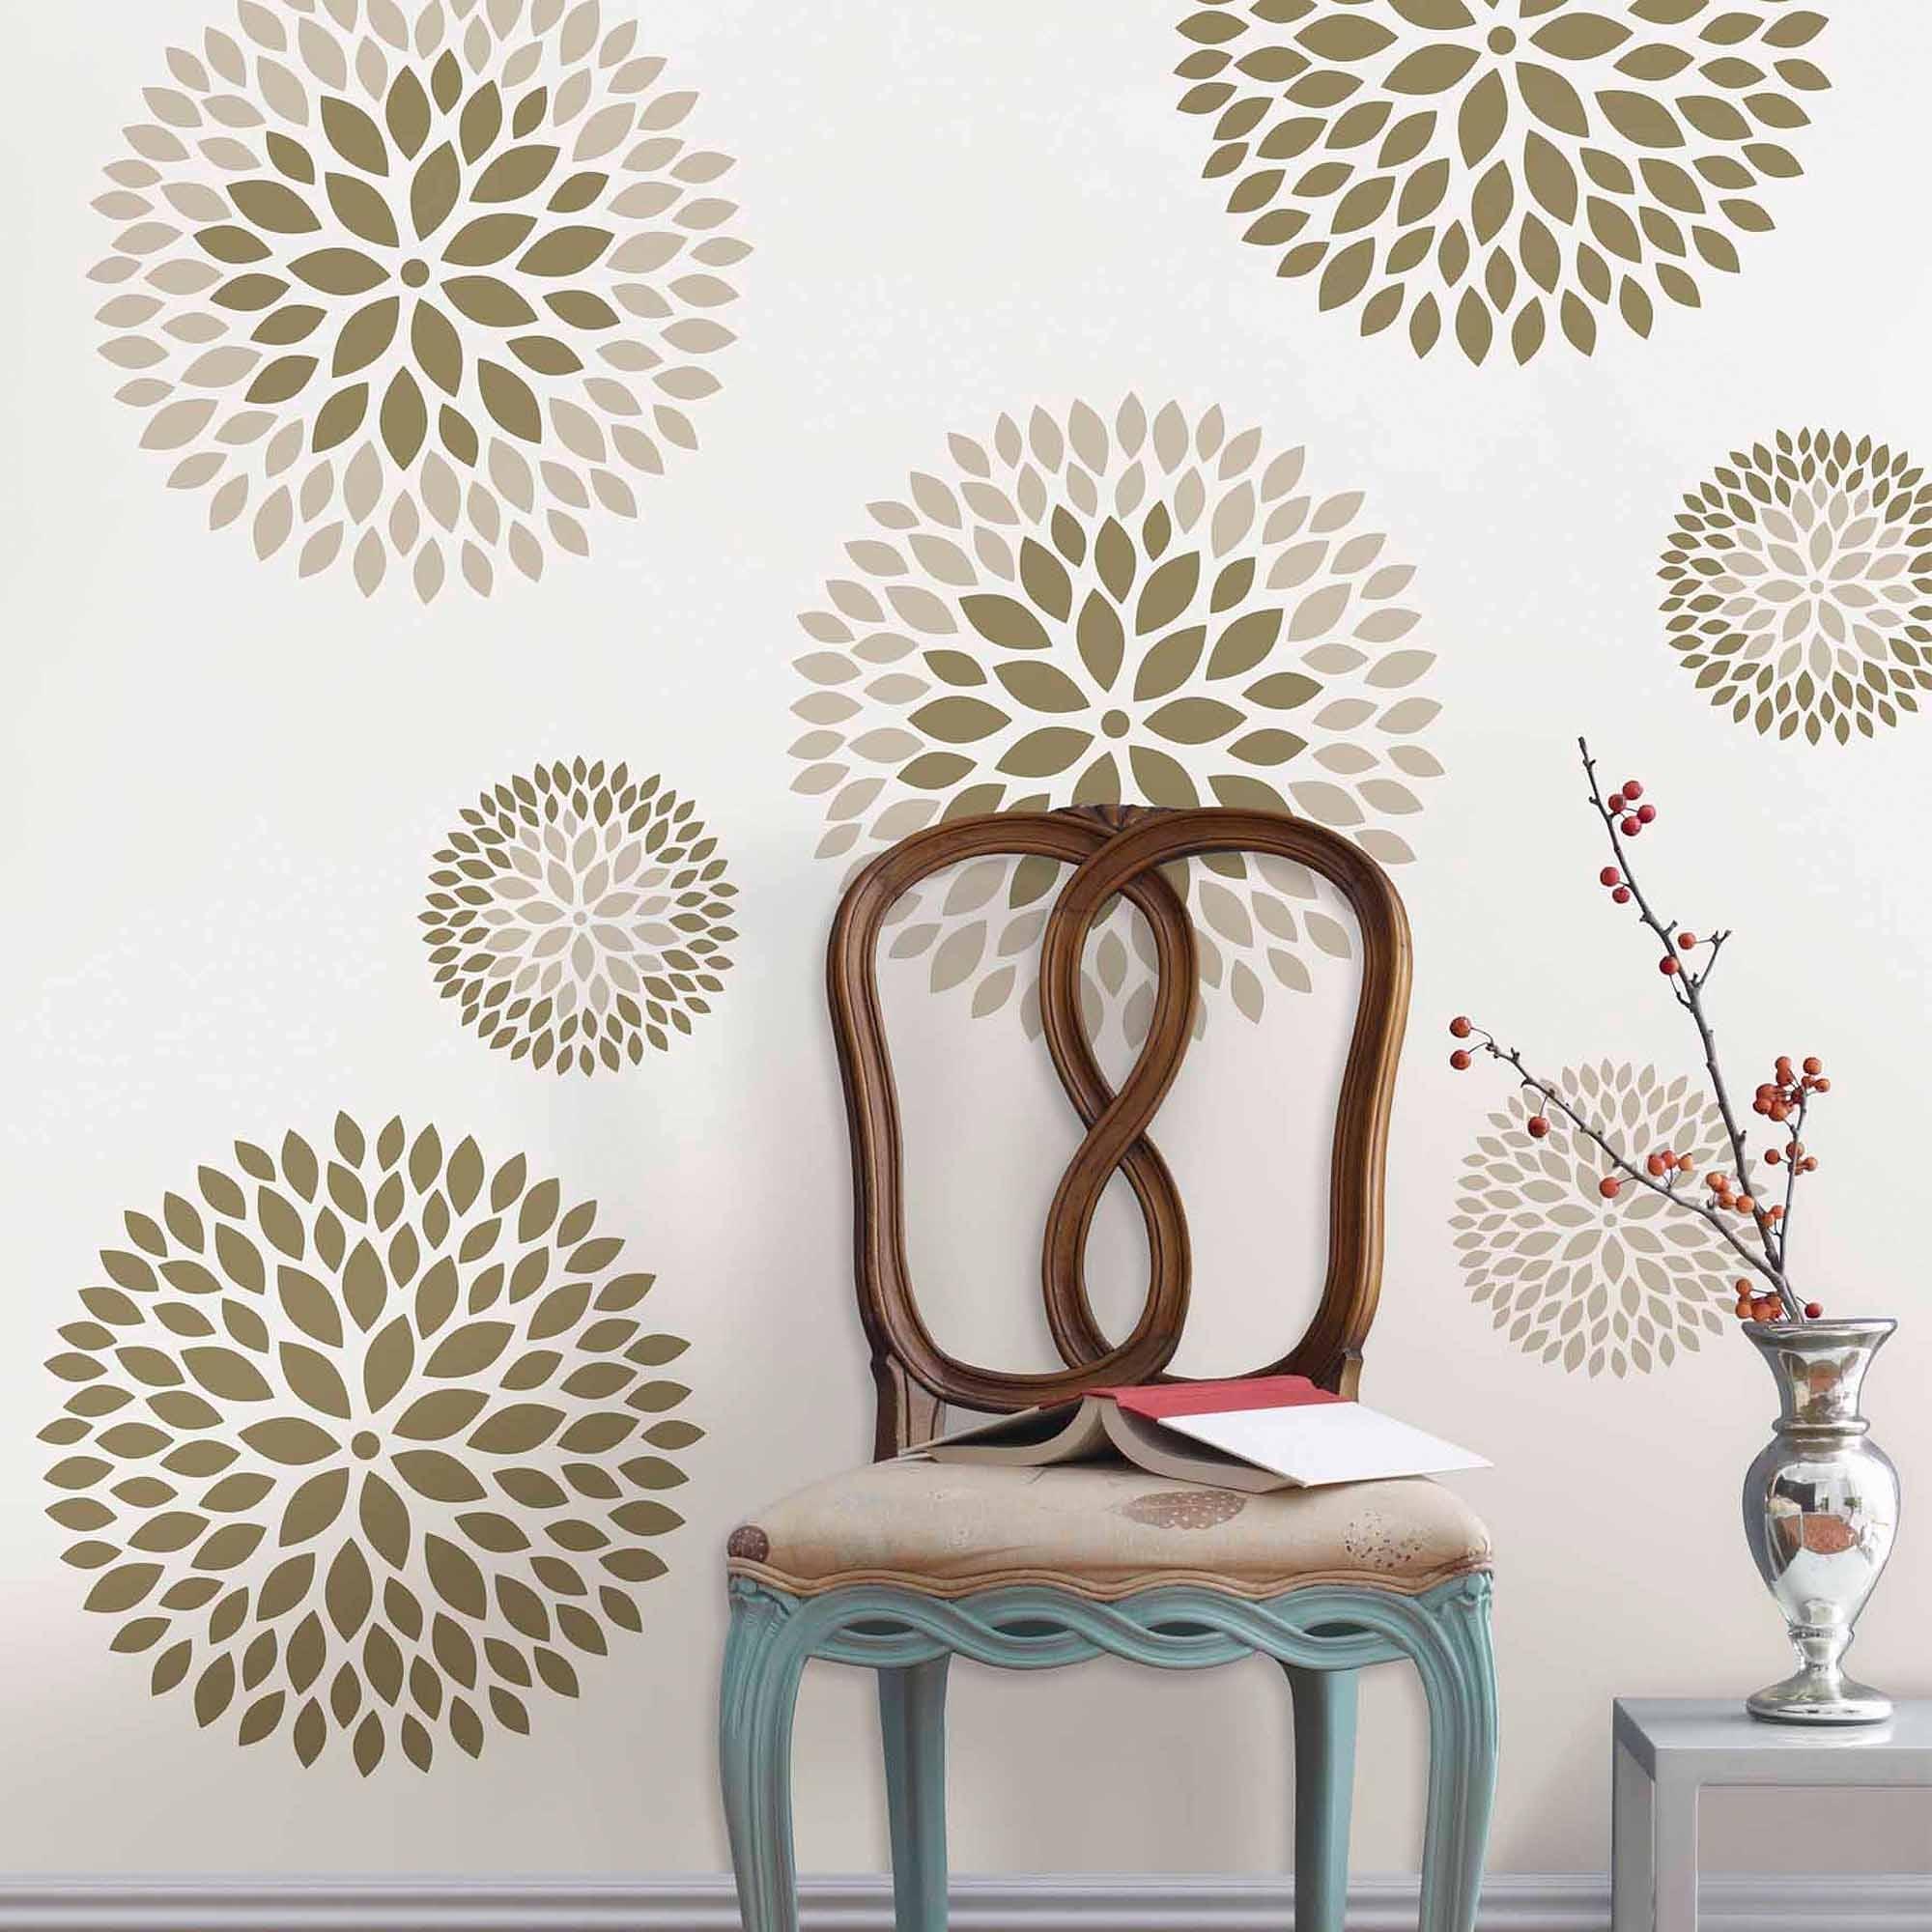 Well Liked Wallpops Chrysanthemum Wall Art Decals Kit – Walmart Regarding Wall Art At Walmart (View 15 of 15)